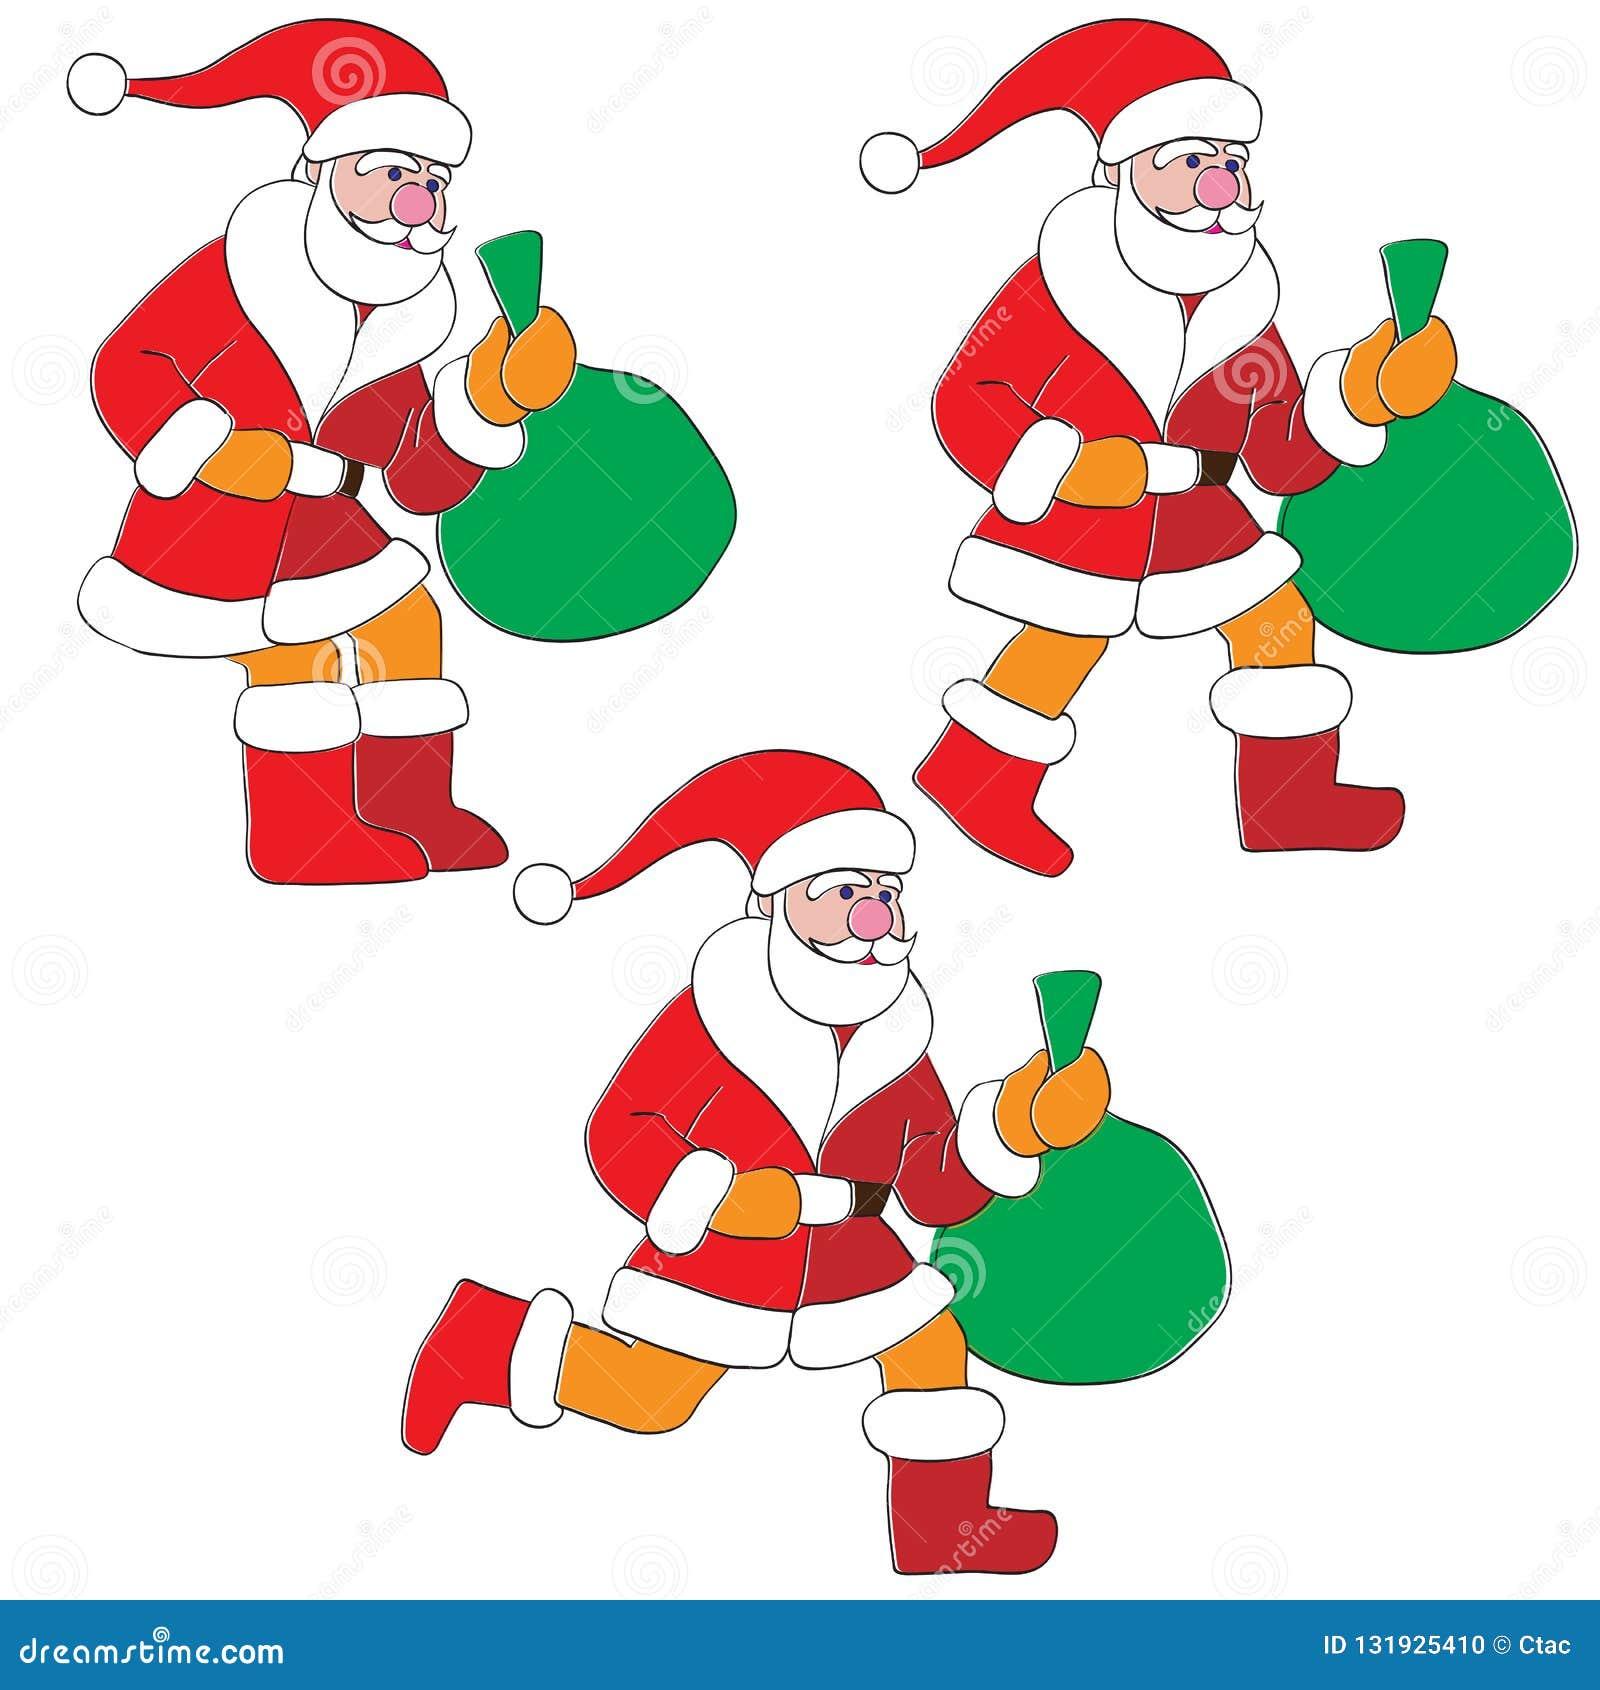 Animated santa stock vector. Illustration of sack, boots - 131925410